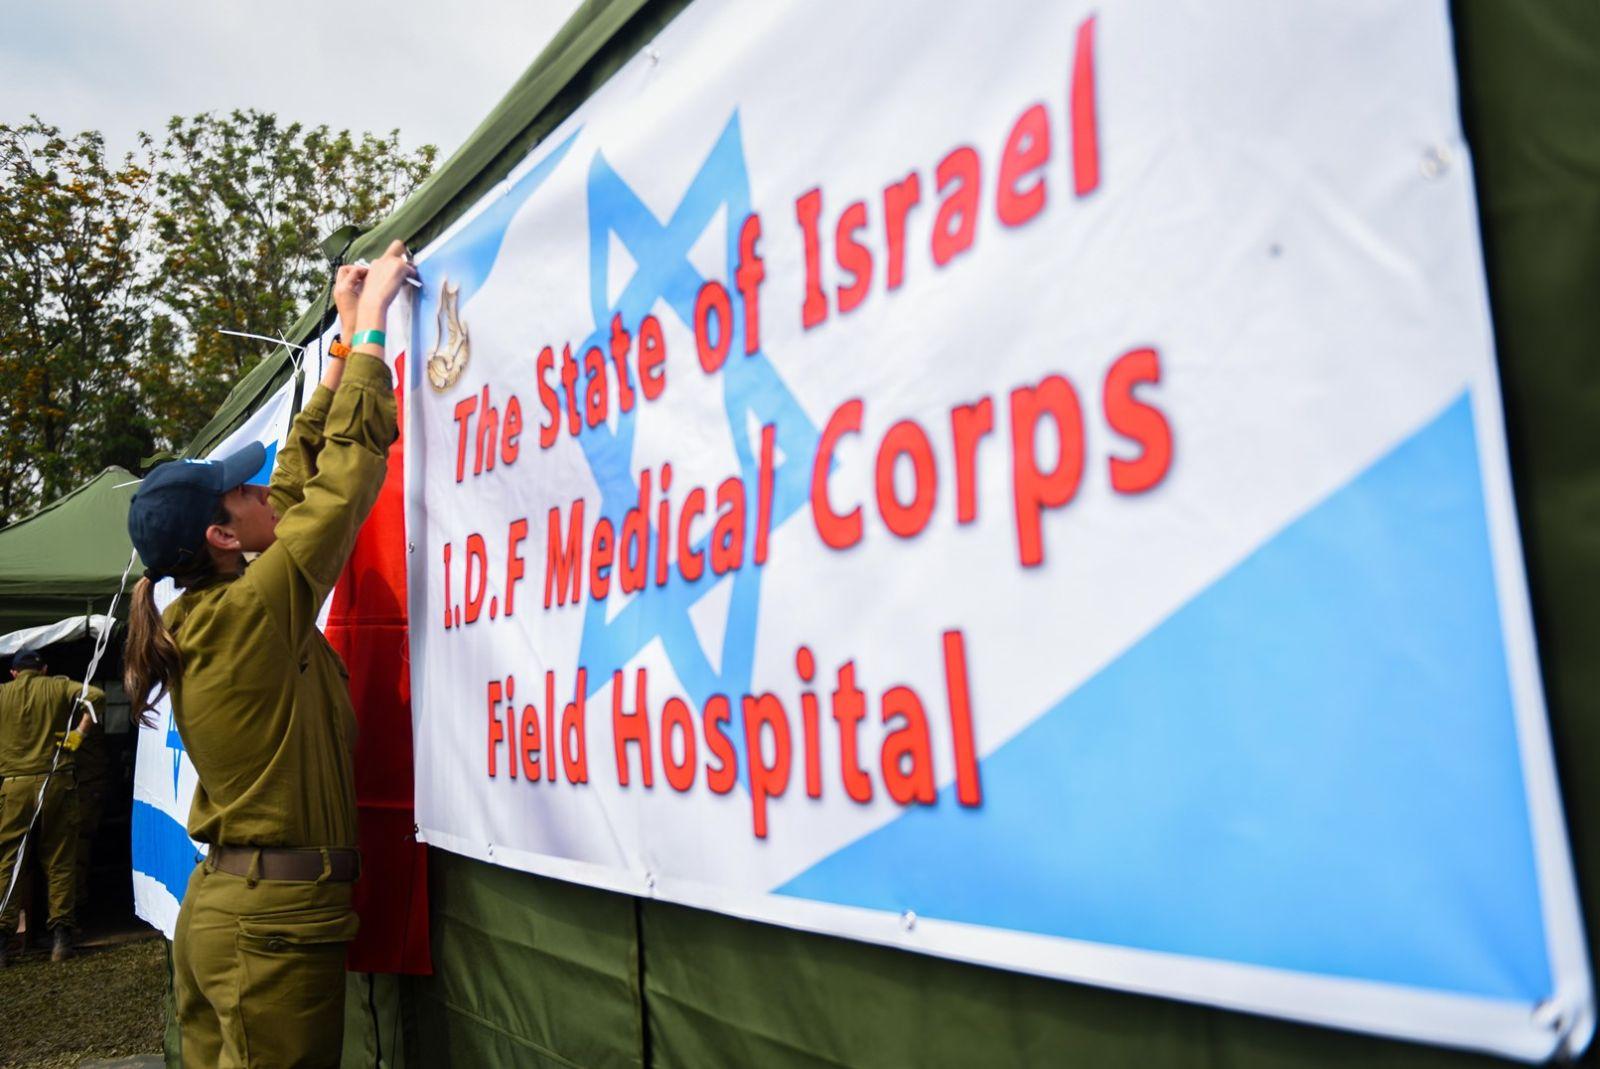 Israeli soldiers establishing a field hospital in Nepal following the earthquake in April 2015. Photo by IDF Spokesperson/FLASH90